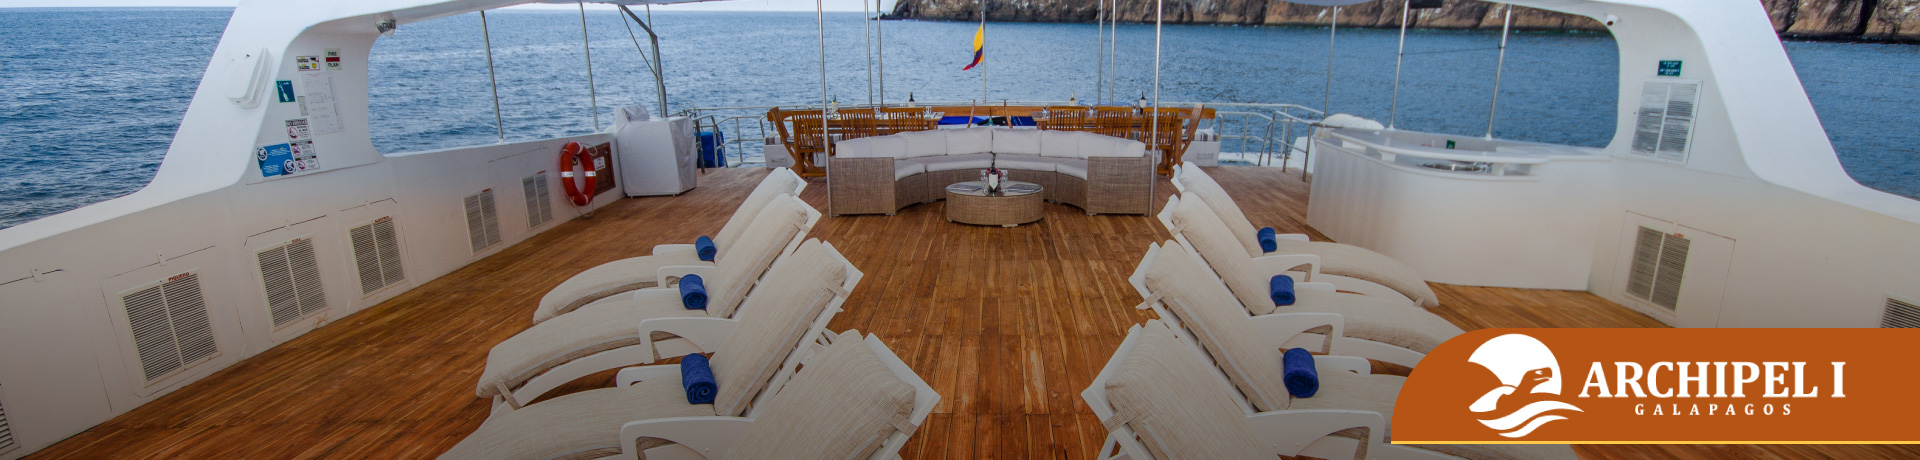 Archipel I Itinerario Galapagos Ecuador tour navegable low cost